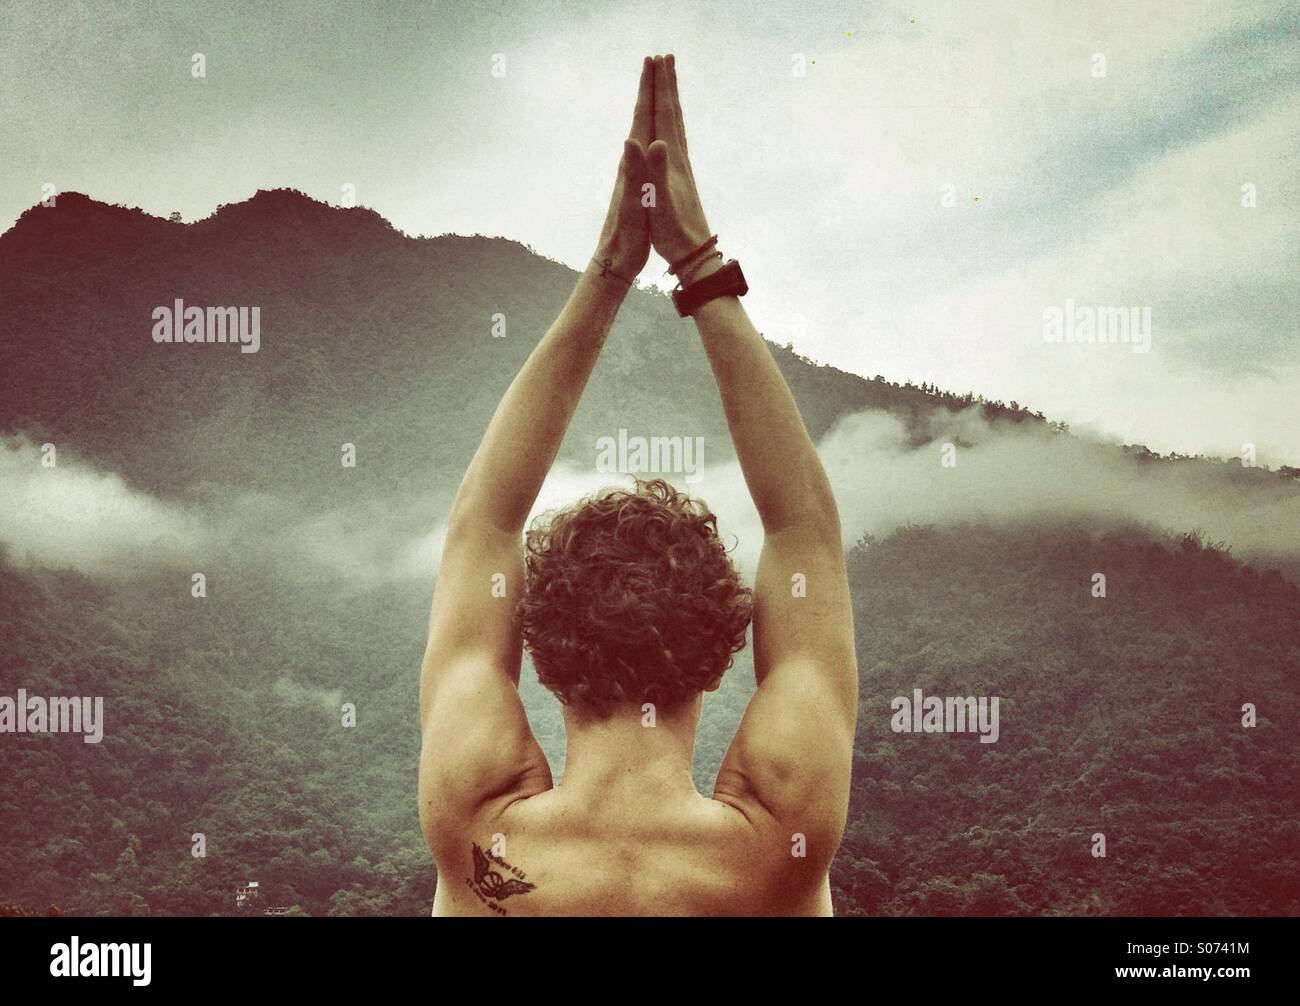 Mountain pose - Stock Image